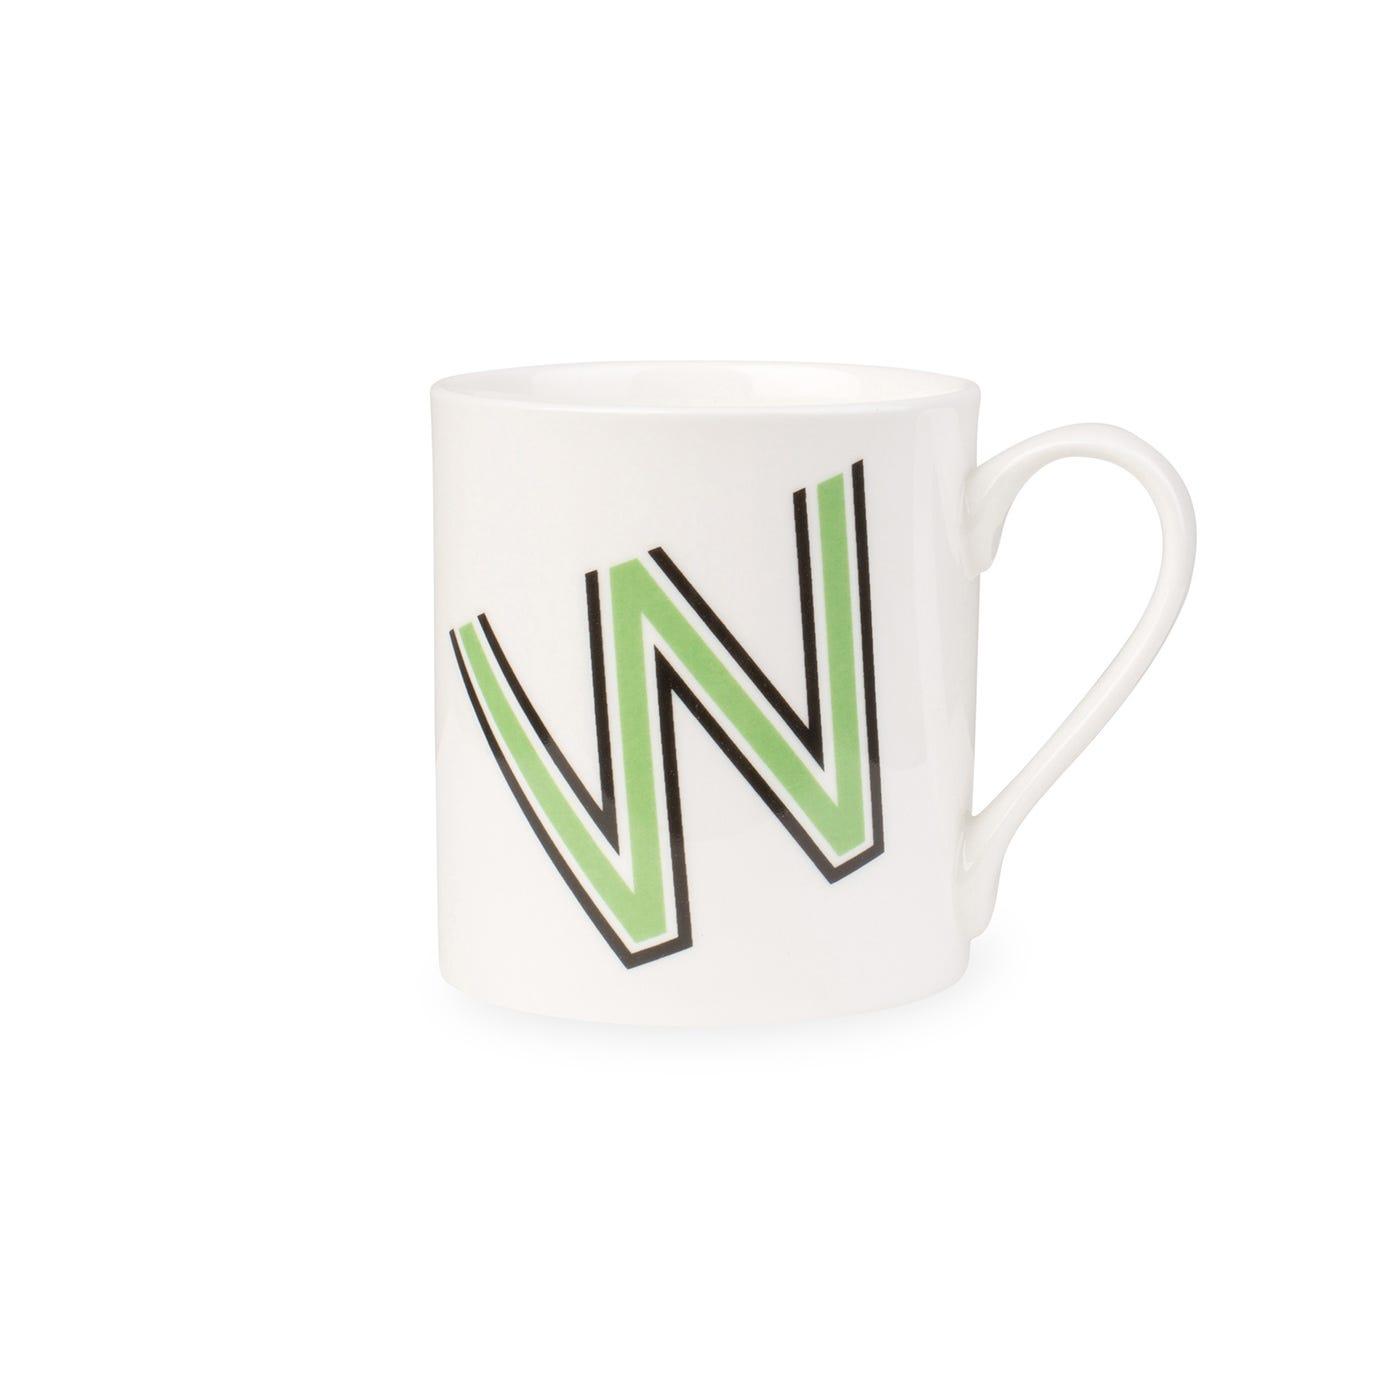 Heal's Heal's Heritage Alphabet Mug W